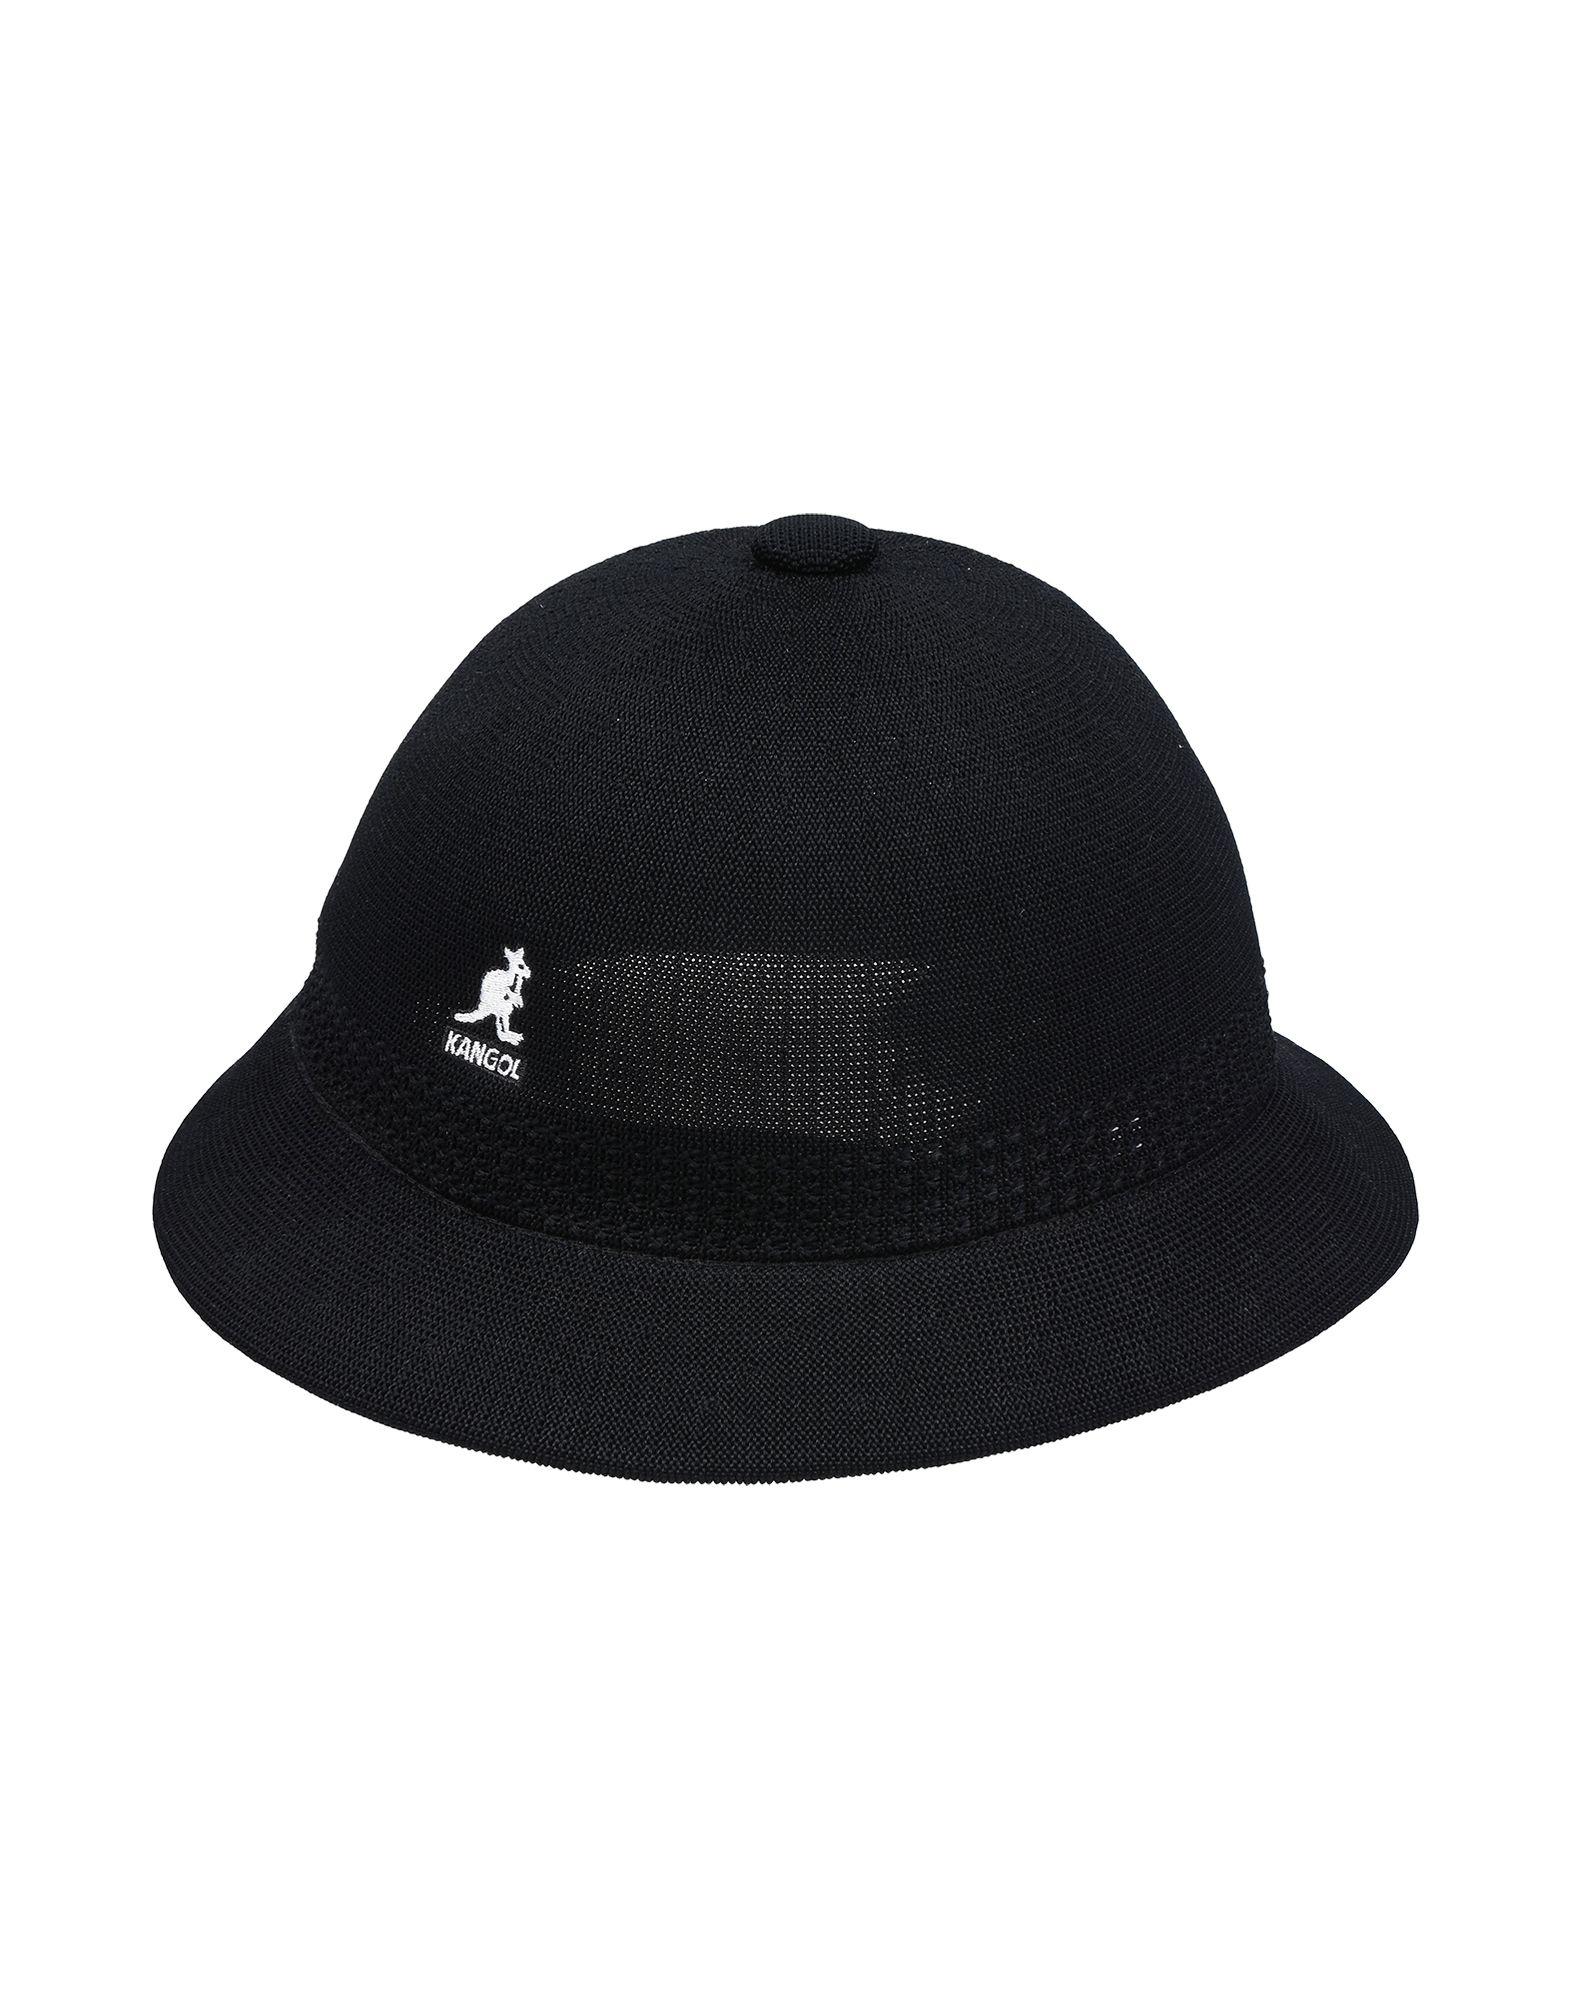 Kangol Hats HATS